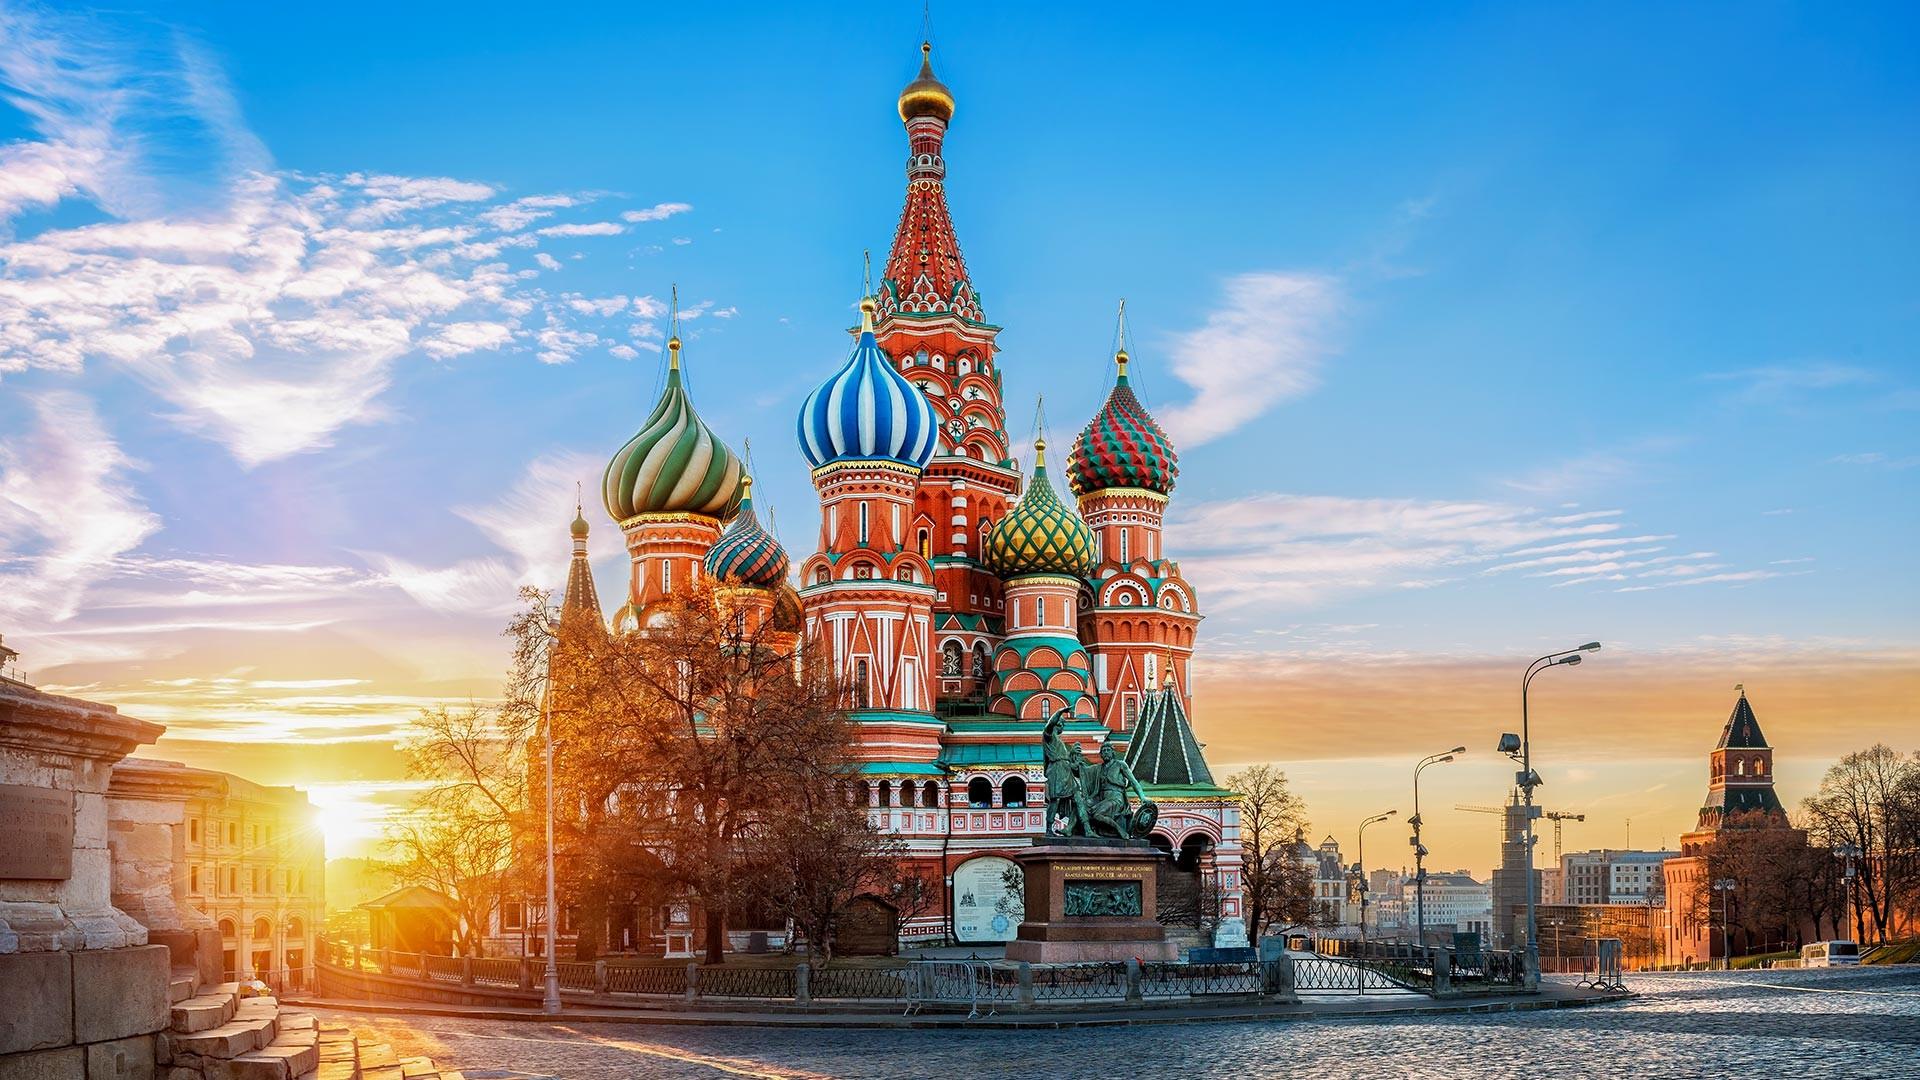 Google Flights: Vuelo sencillo Cancún - Moscú